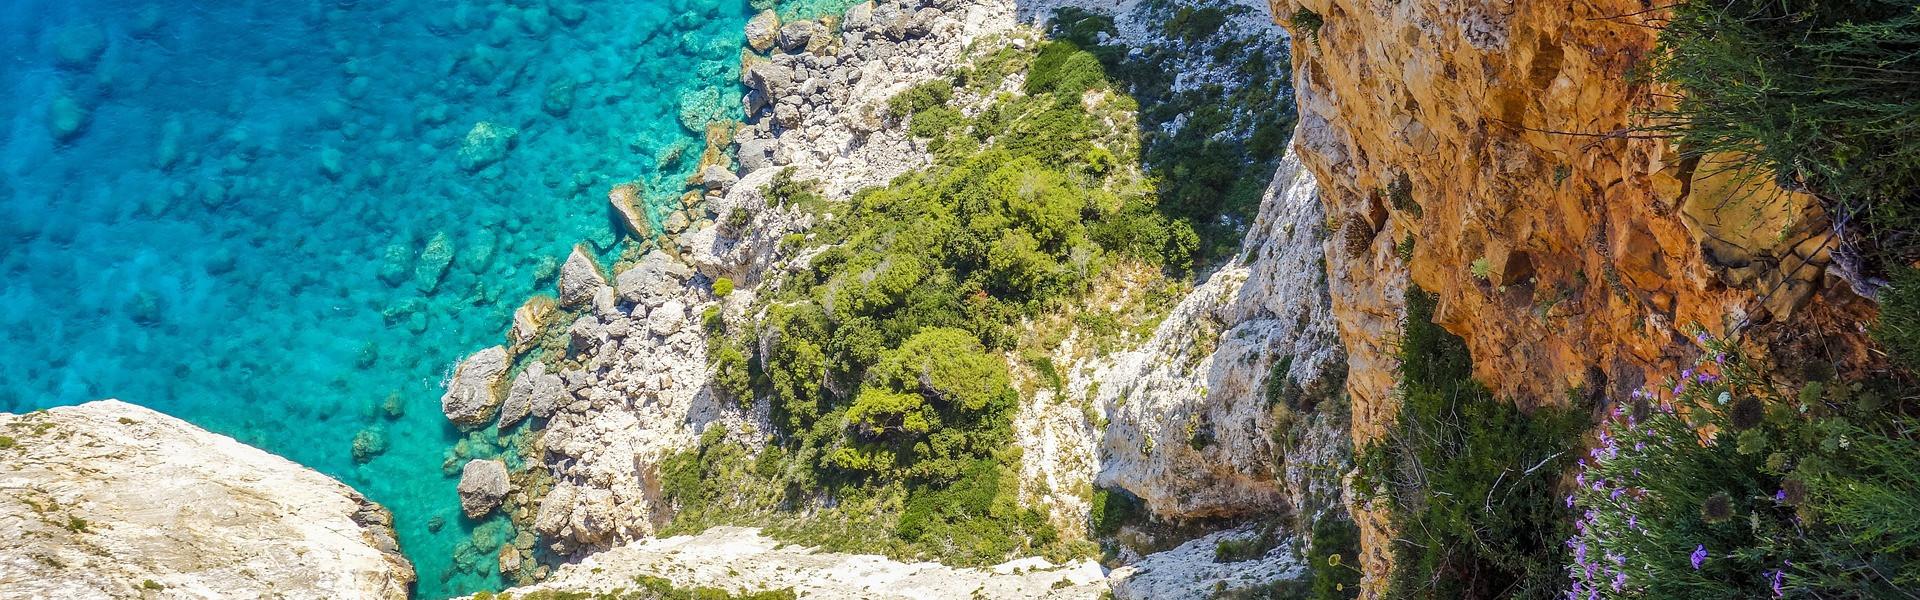 Destination image of Europe du Sud